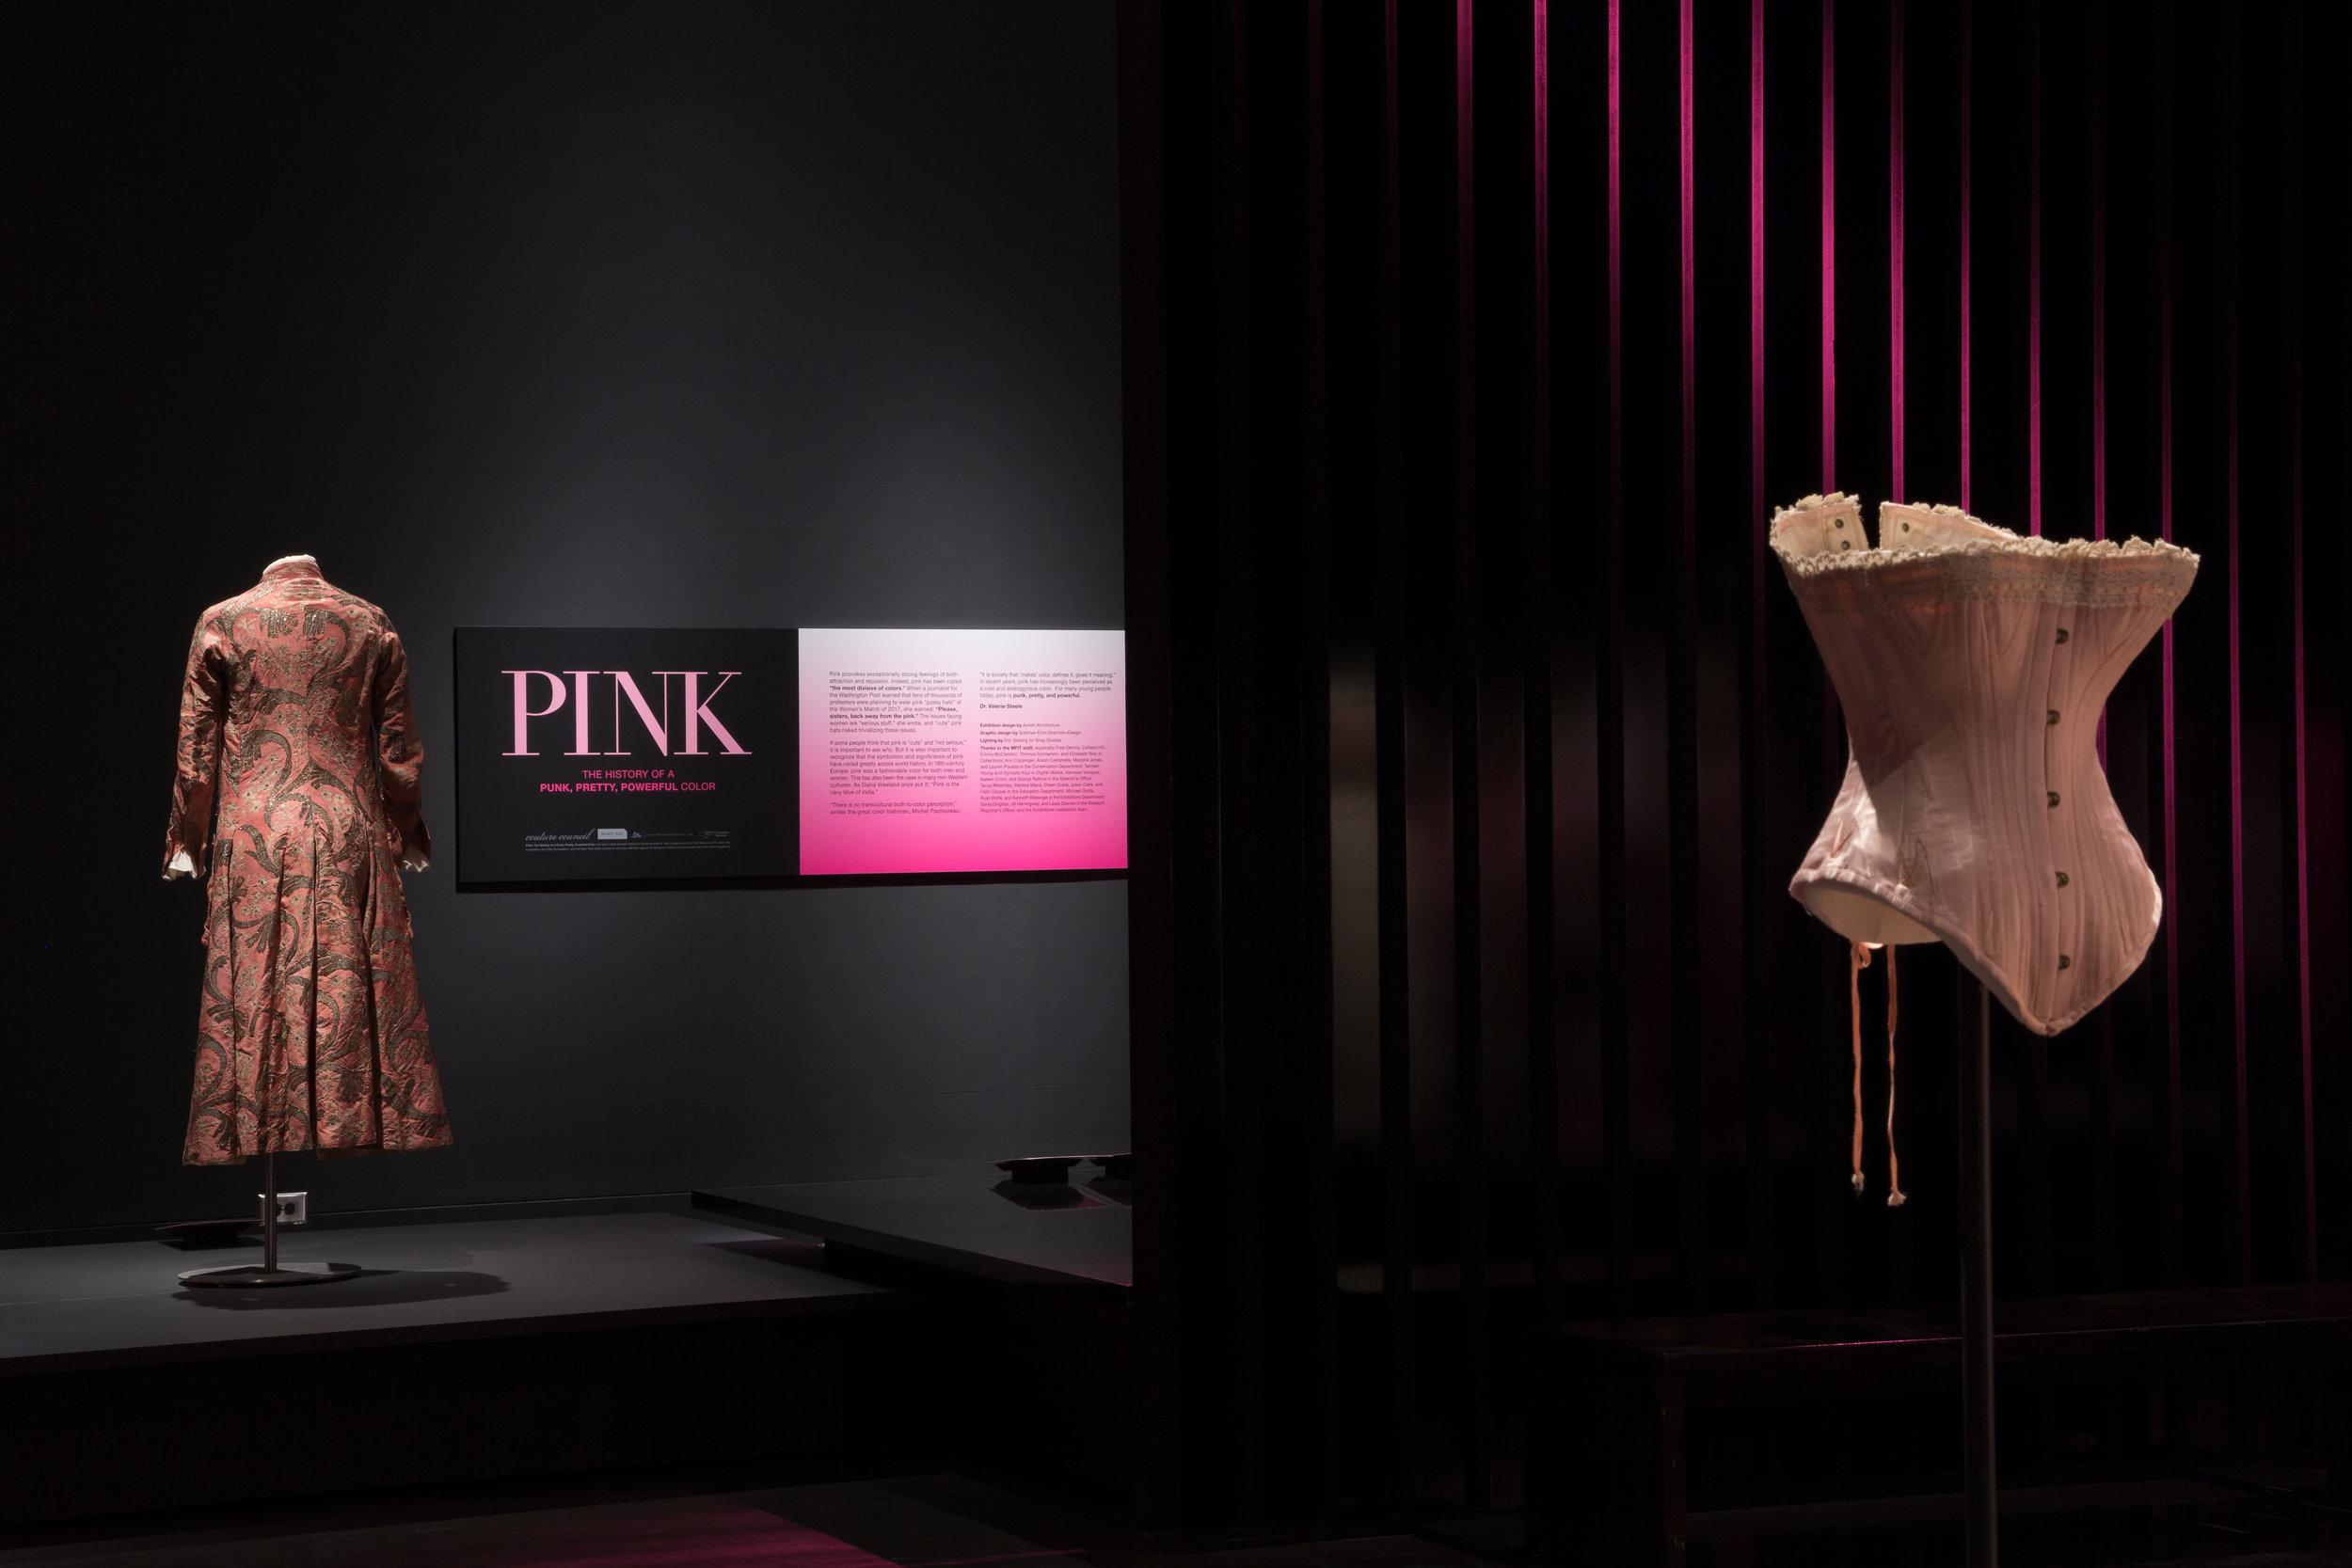 Pink_61.jpg